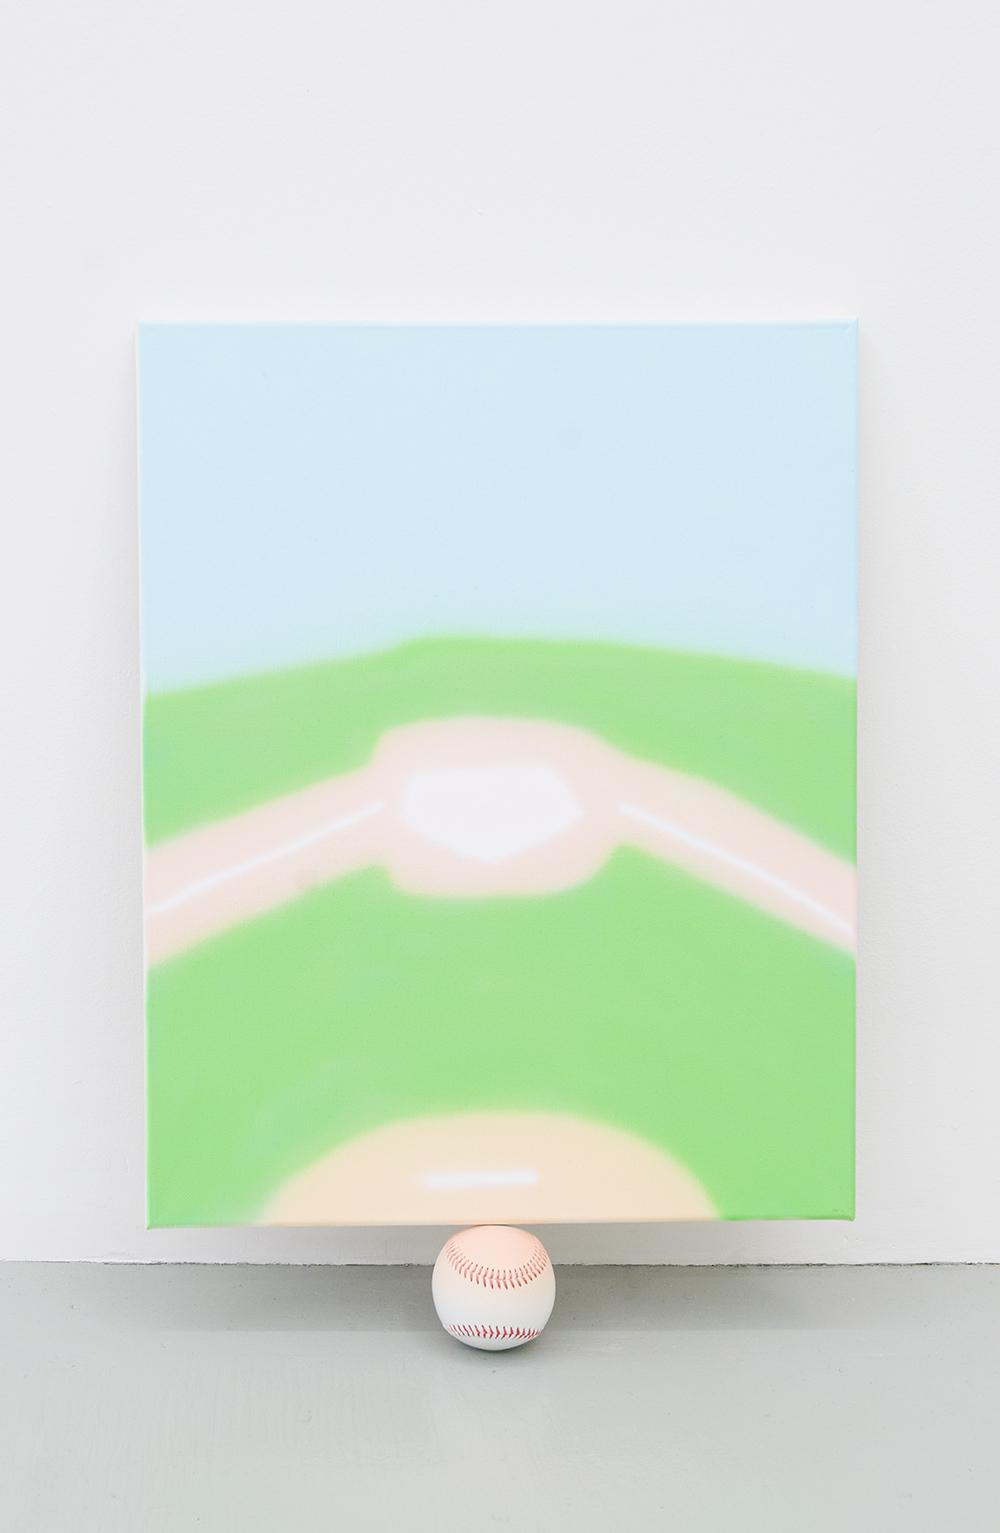 Jonny Paul Gillette Goal on baseball ball Acrylic polymer on canvas, baseball ball